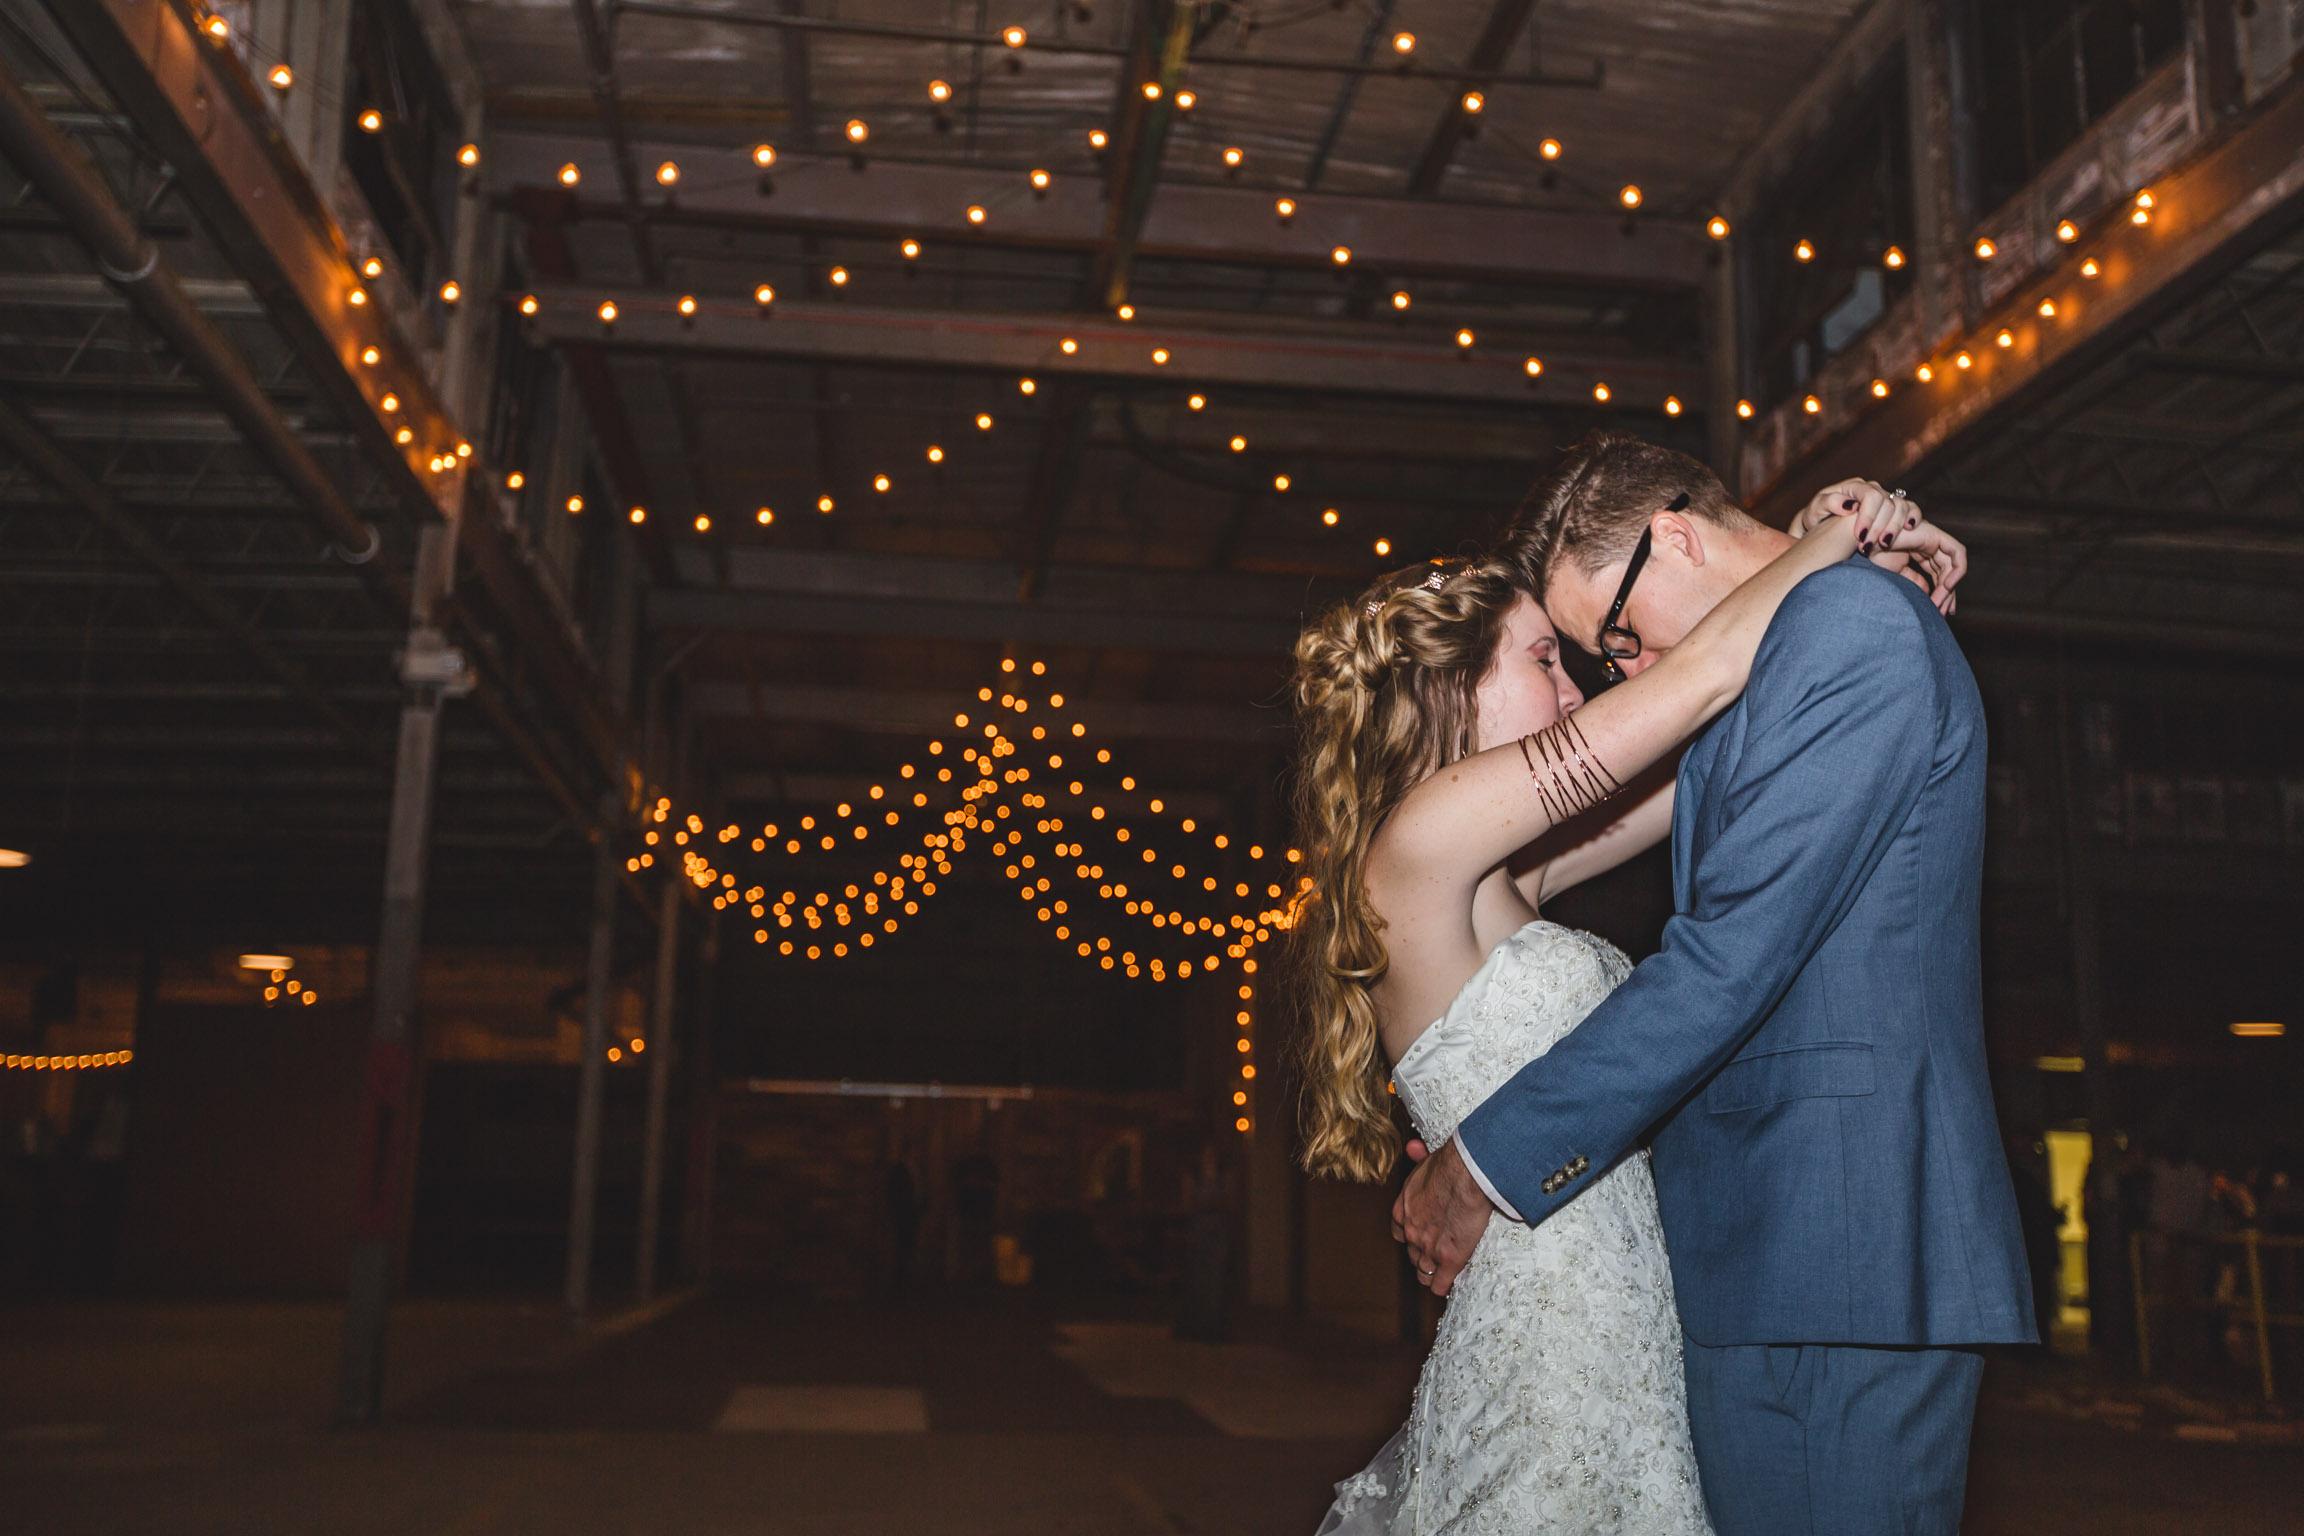 Adam-Szrmack-The-Glass-Factory-Wedding-185.jpg